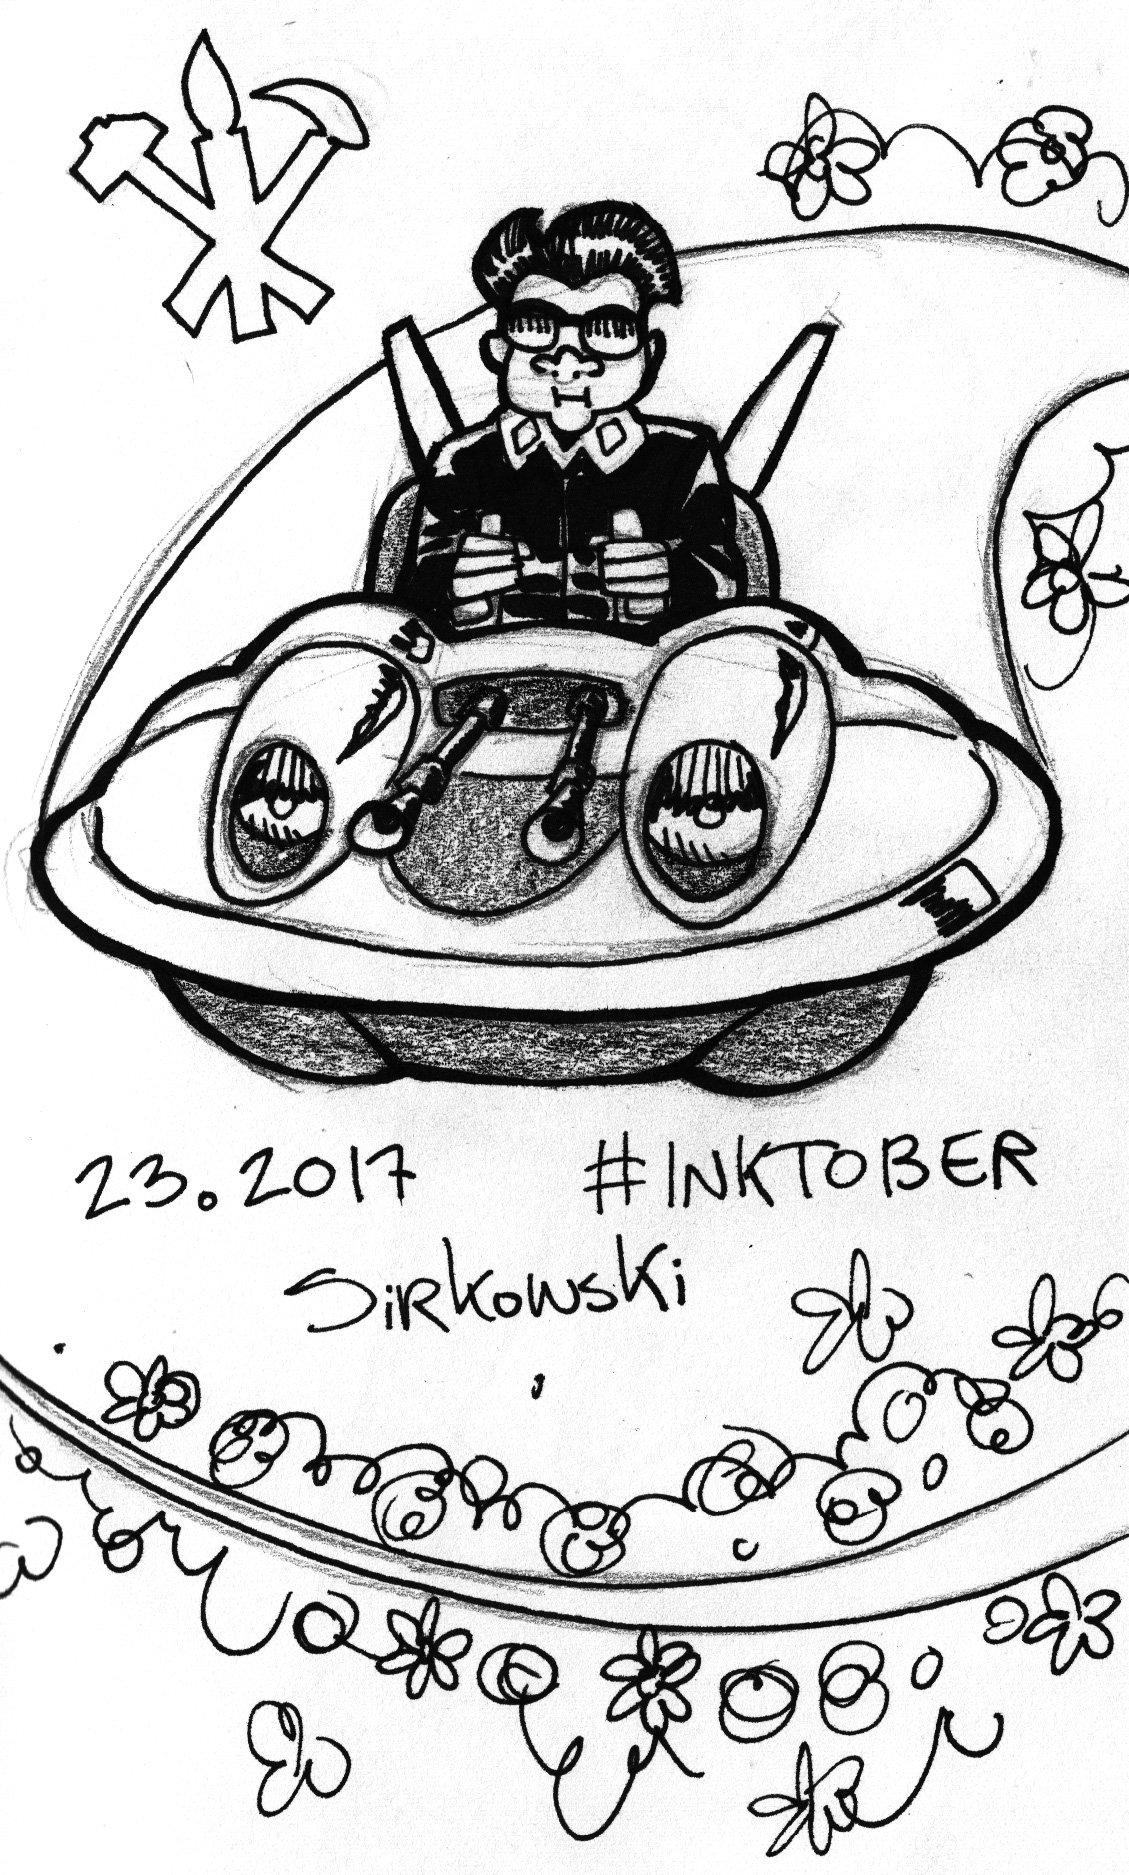 sirkowski on twitter meep meep best korea in thru inktober 4 Seater Go Karts